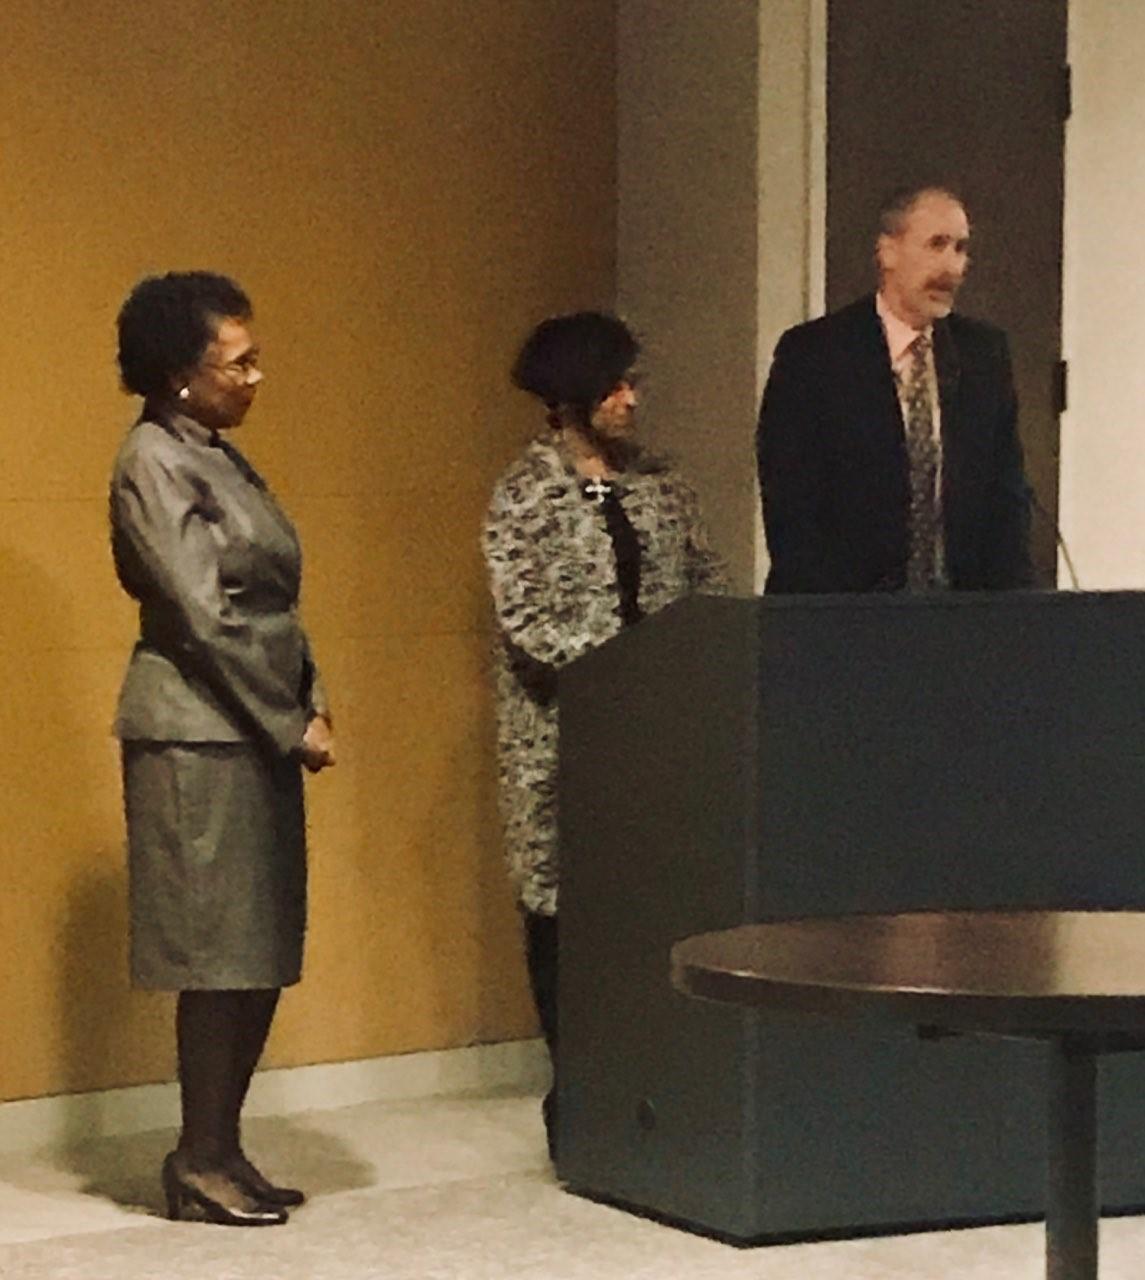 Judge Evans' Retirement